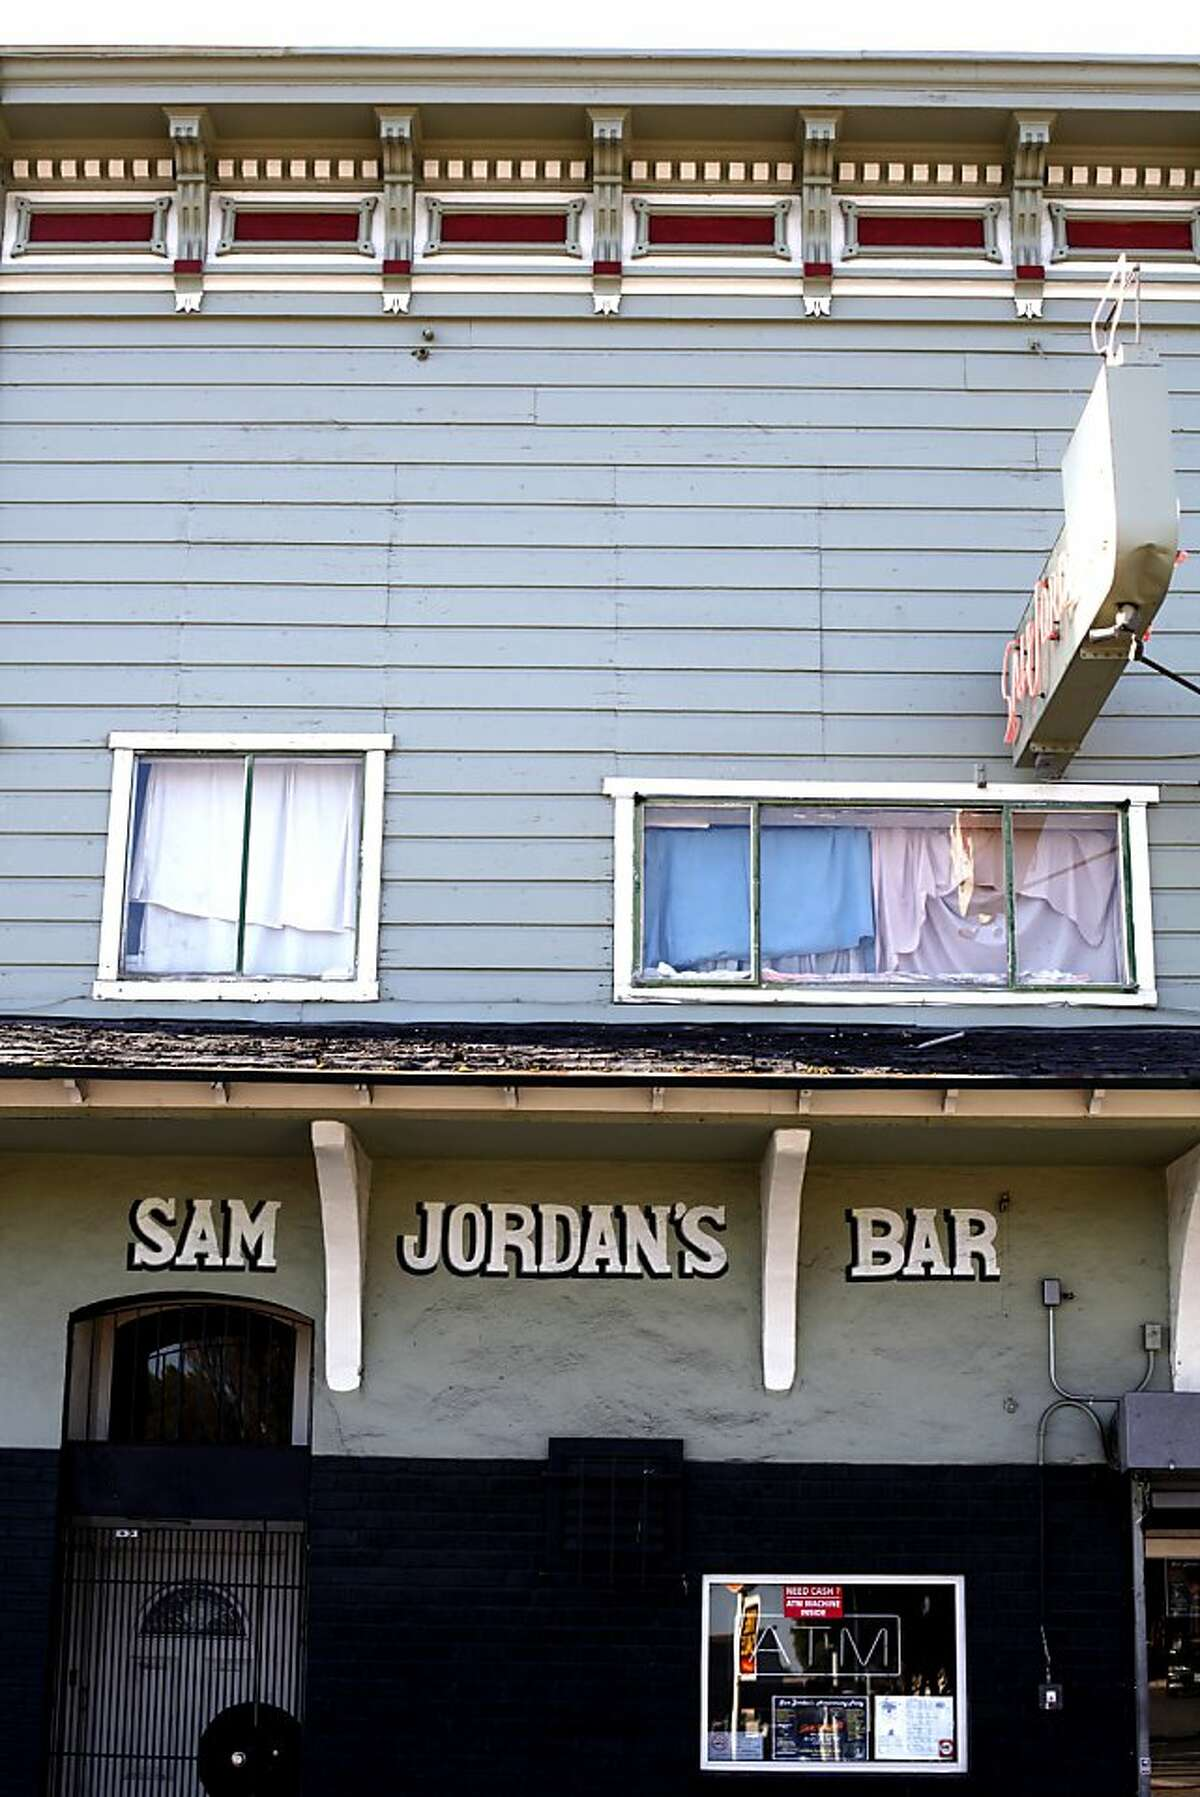 Sam Jordan's Bar is shown in San Francisco, Calif., Monday, January 21, 2013. The bar recently obtained landmark status.